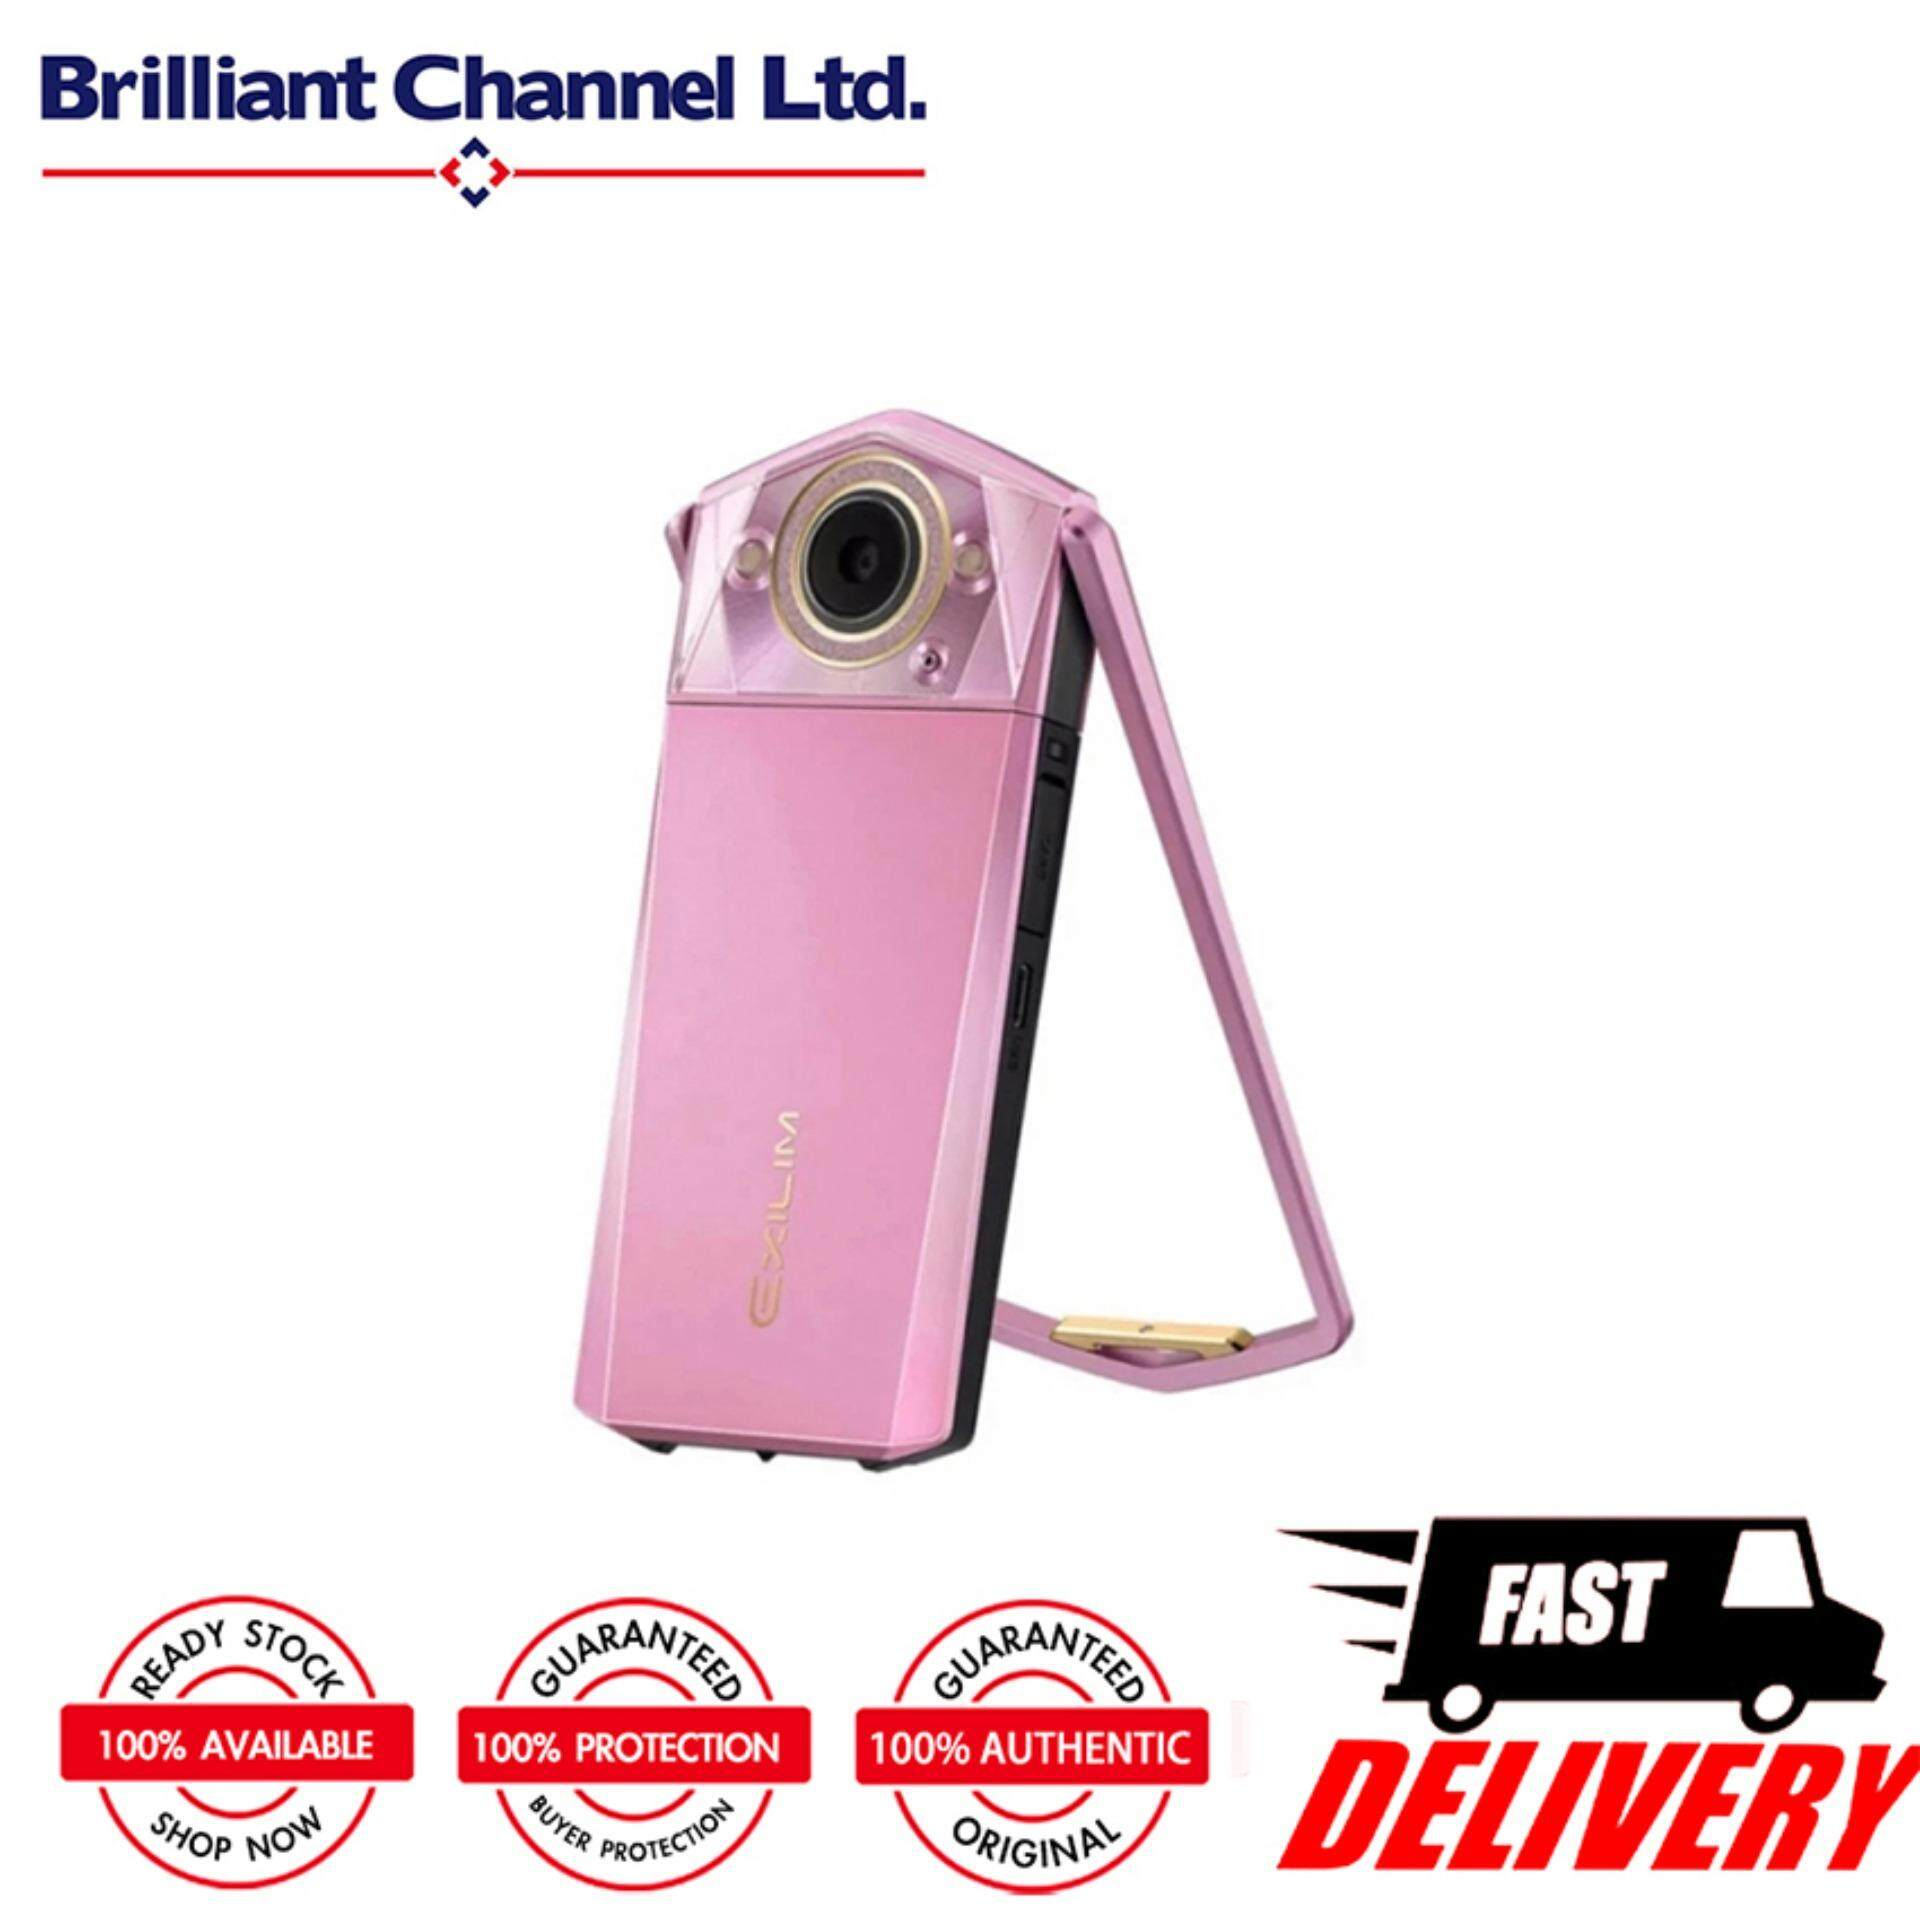 Casio Exilim EX-TR80 BEAUTY CAMERA Digital Camera - intl